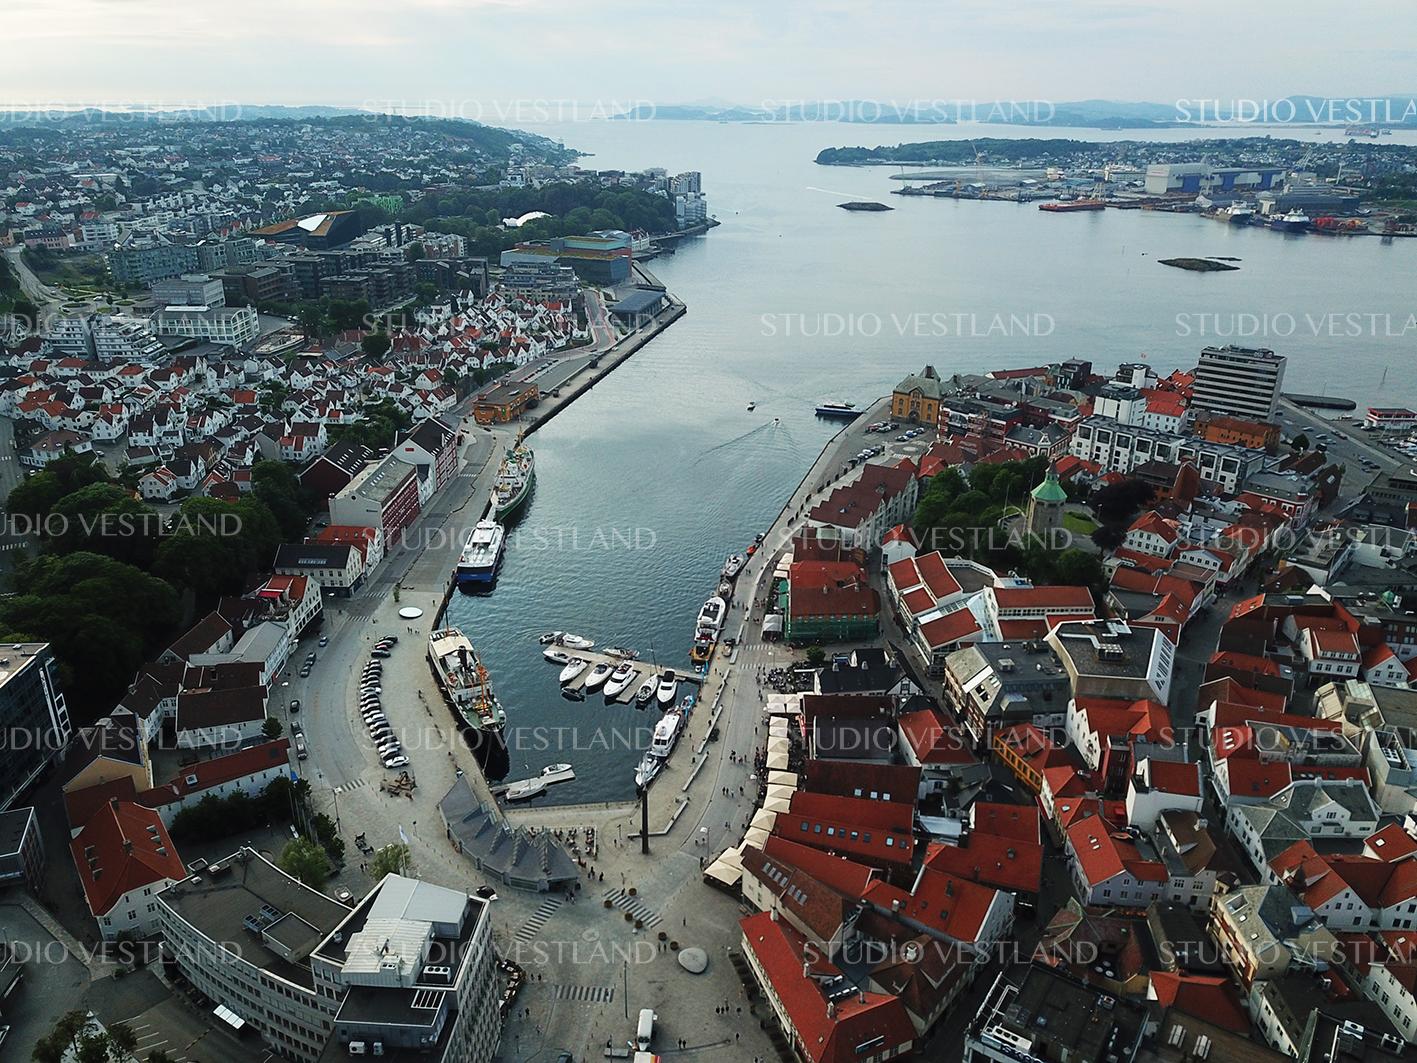 Studio Vestland - Stavanger 33